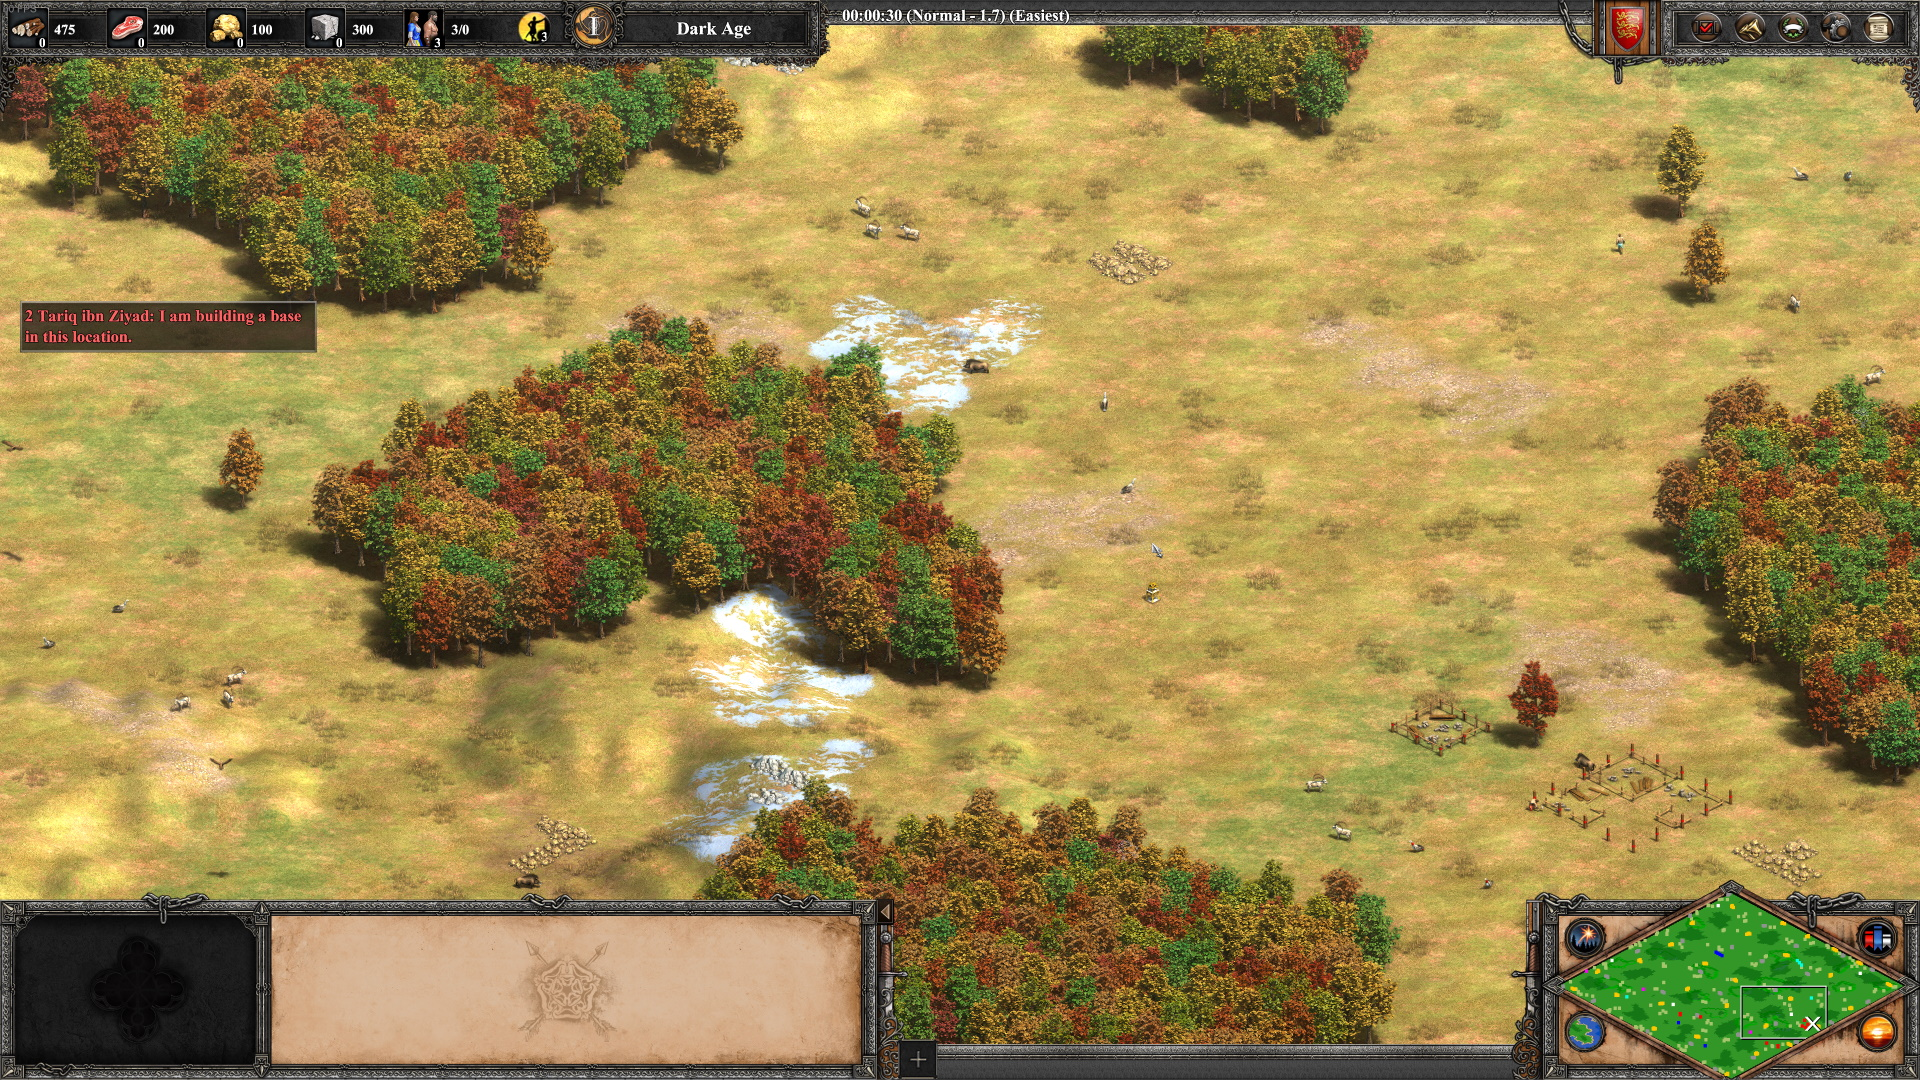 land_nomad_aoe2de.jpg